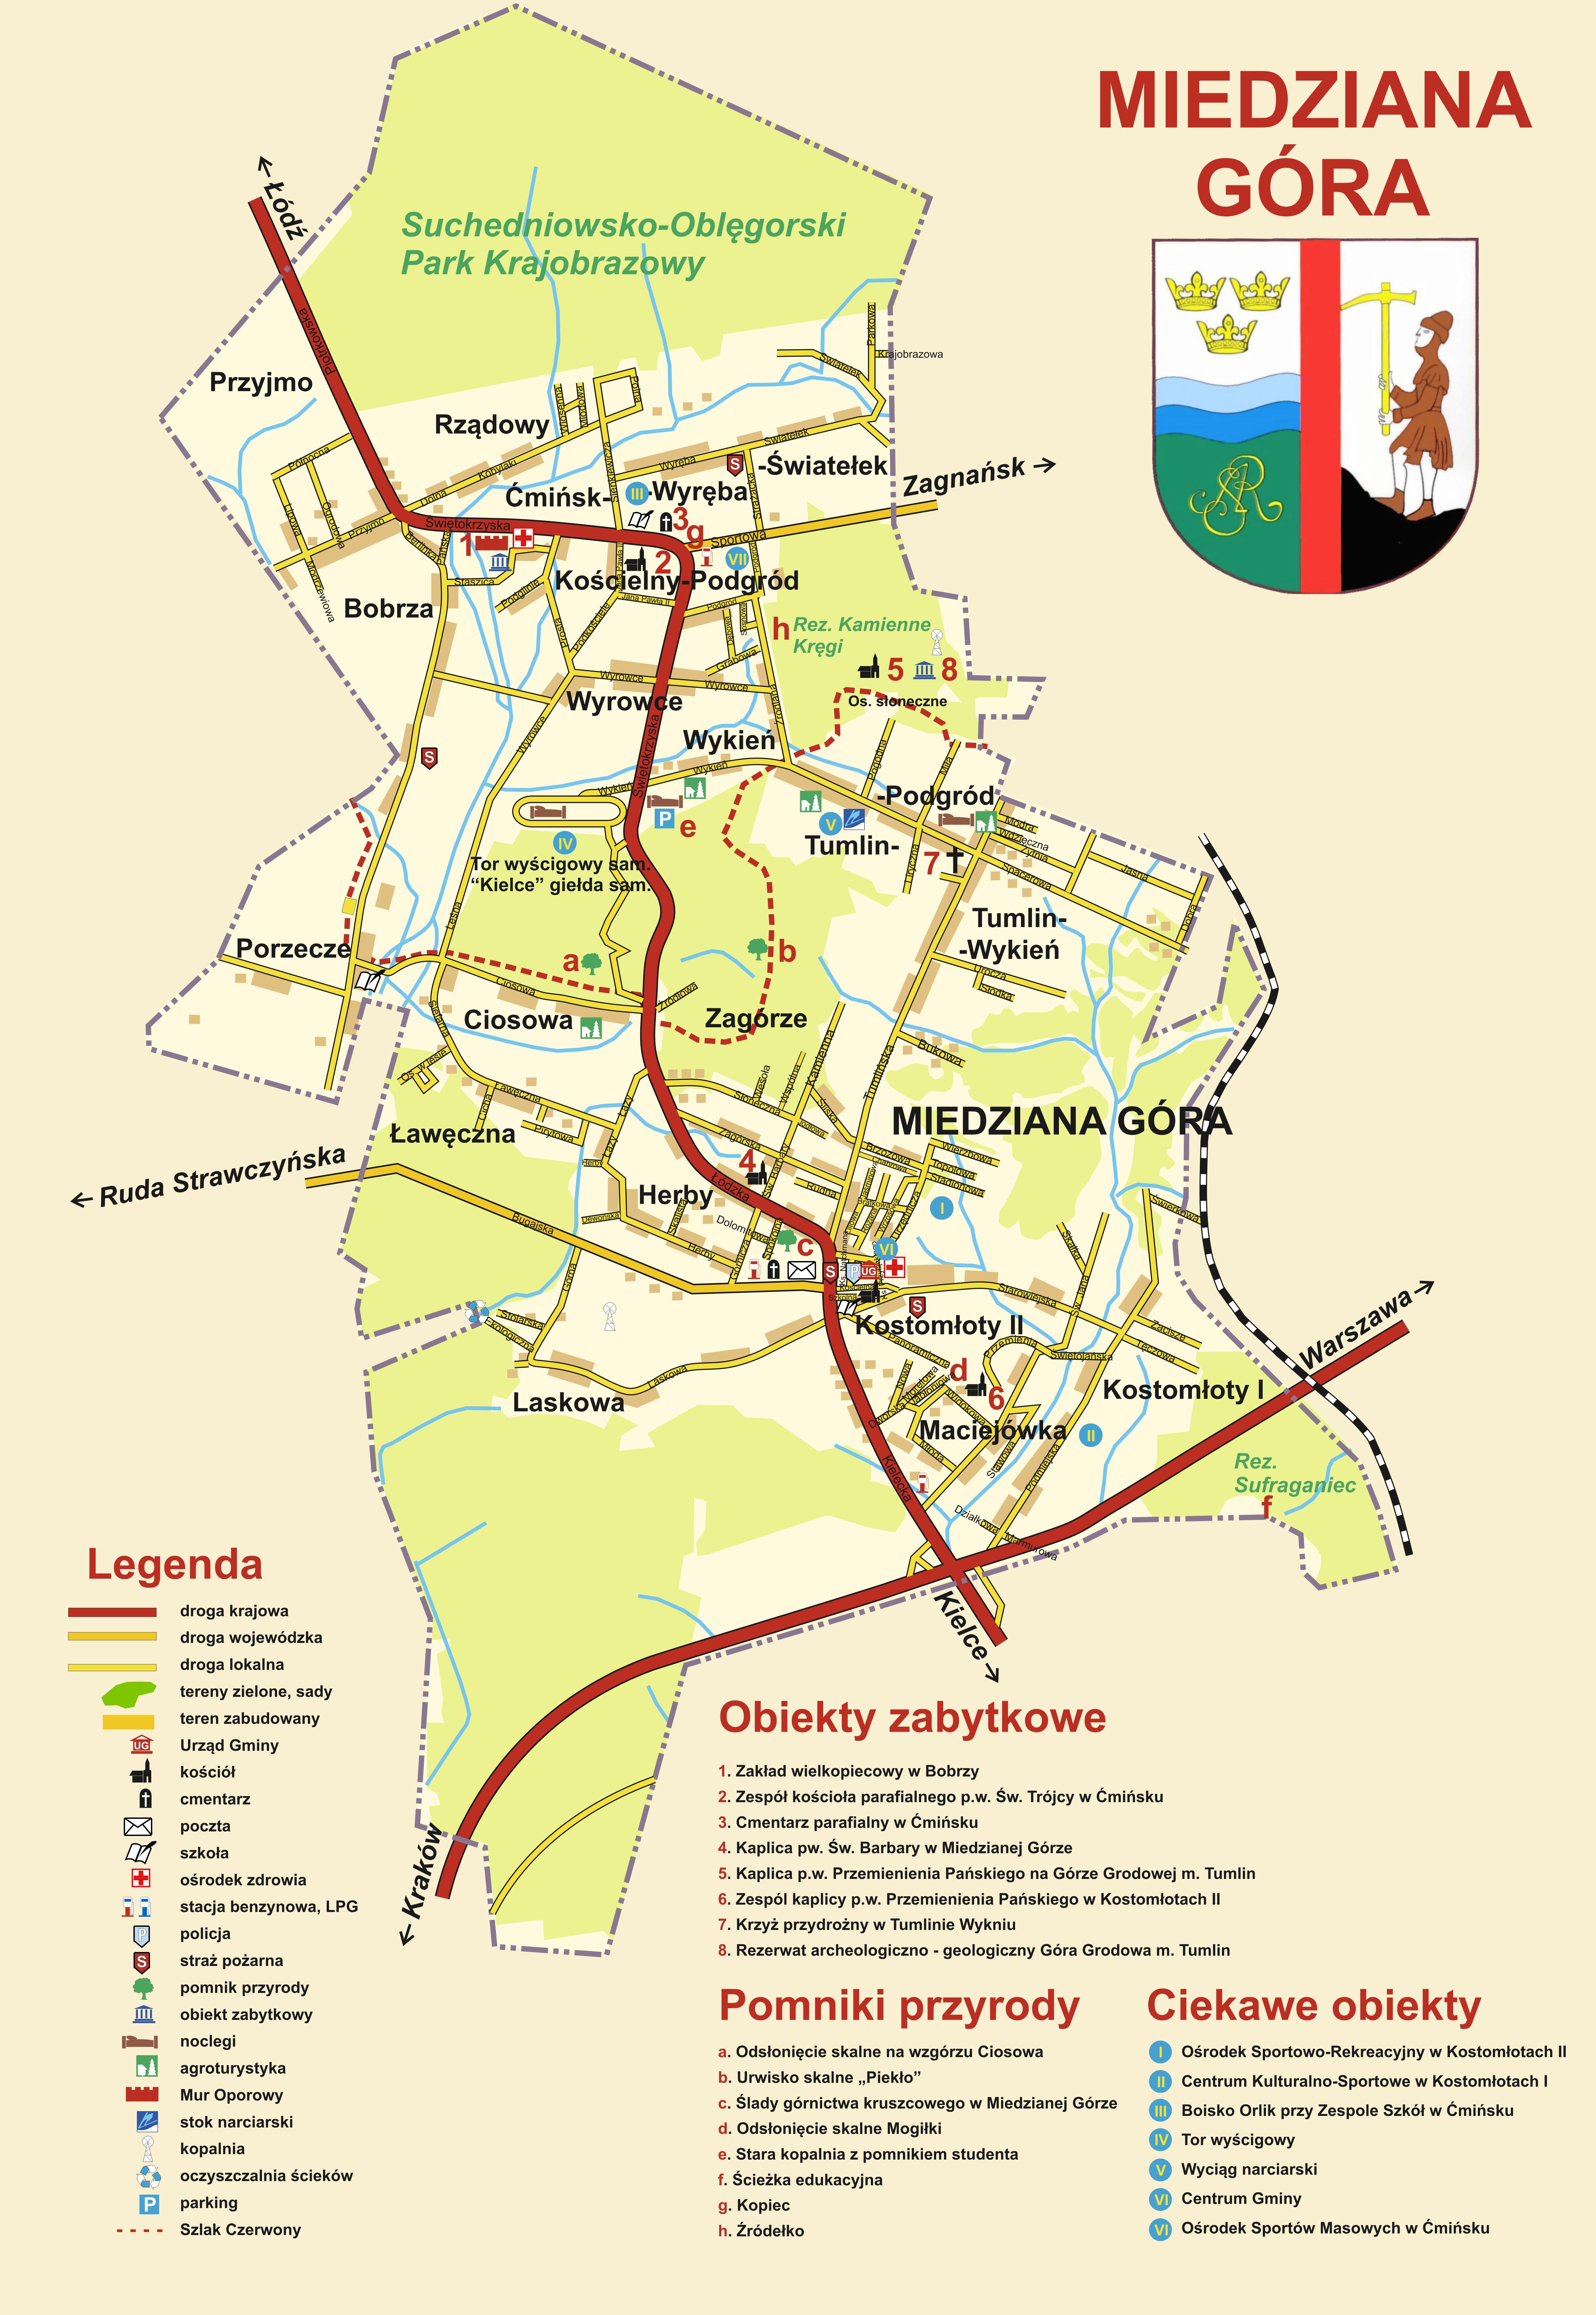 http://miedziana-gora.pl/mapa/mapa_13_03_11.jpg